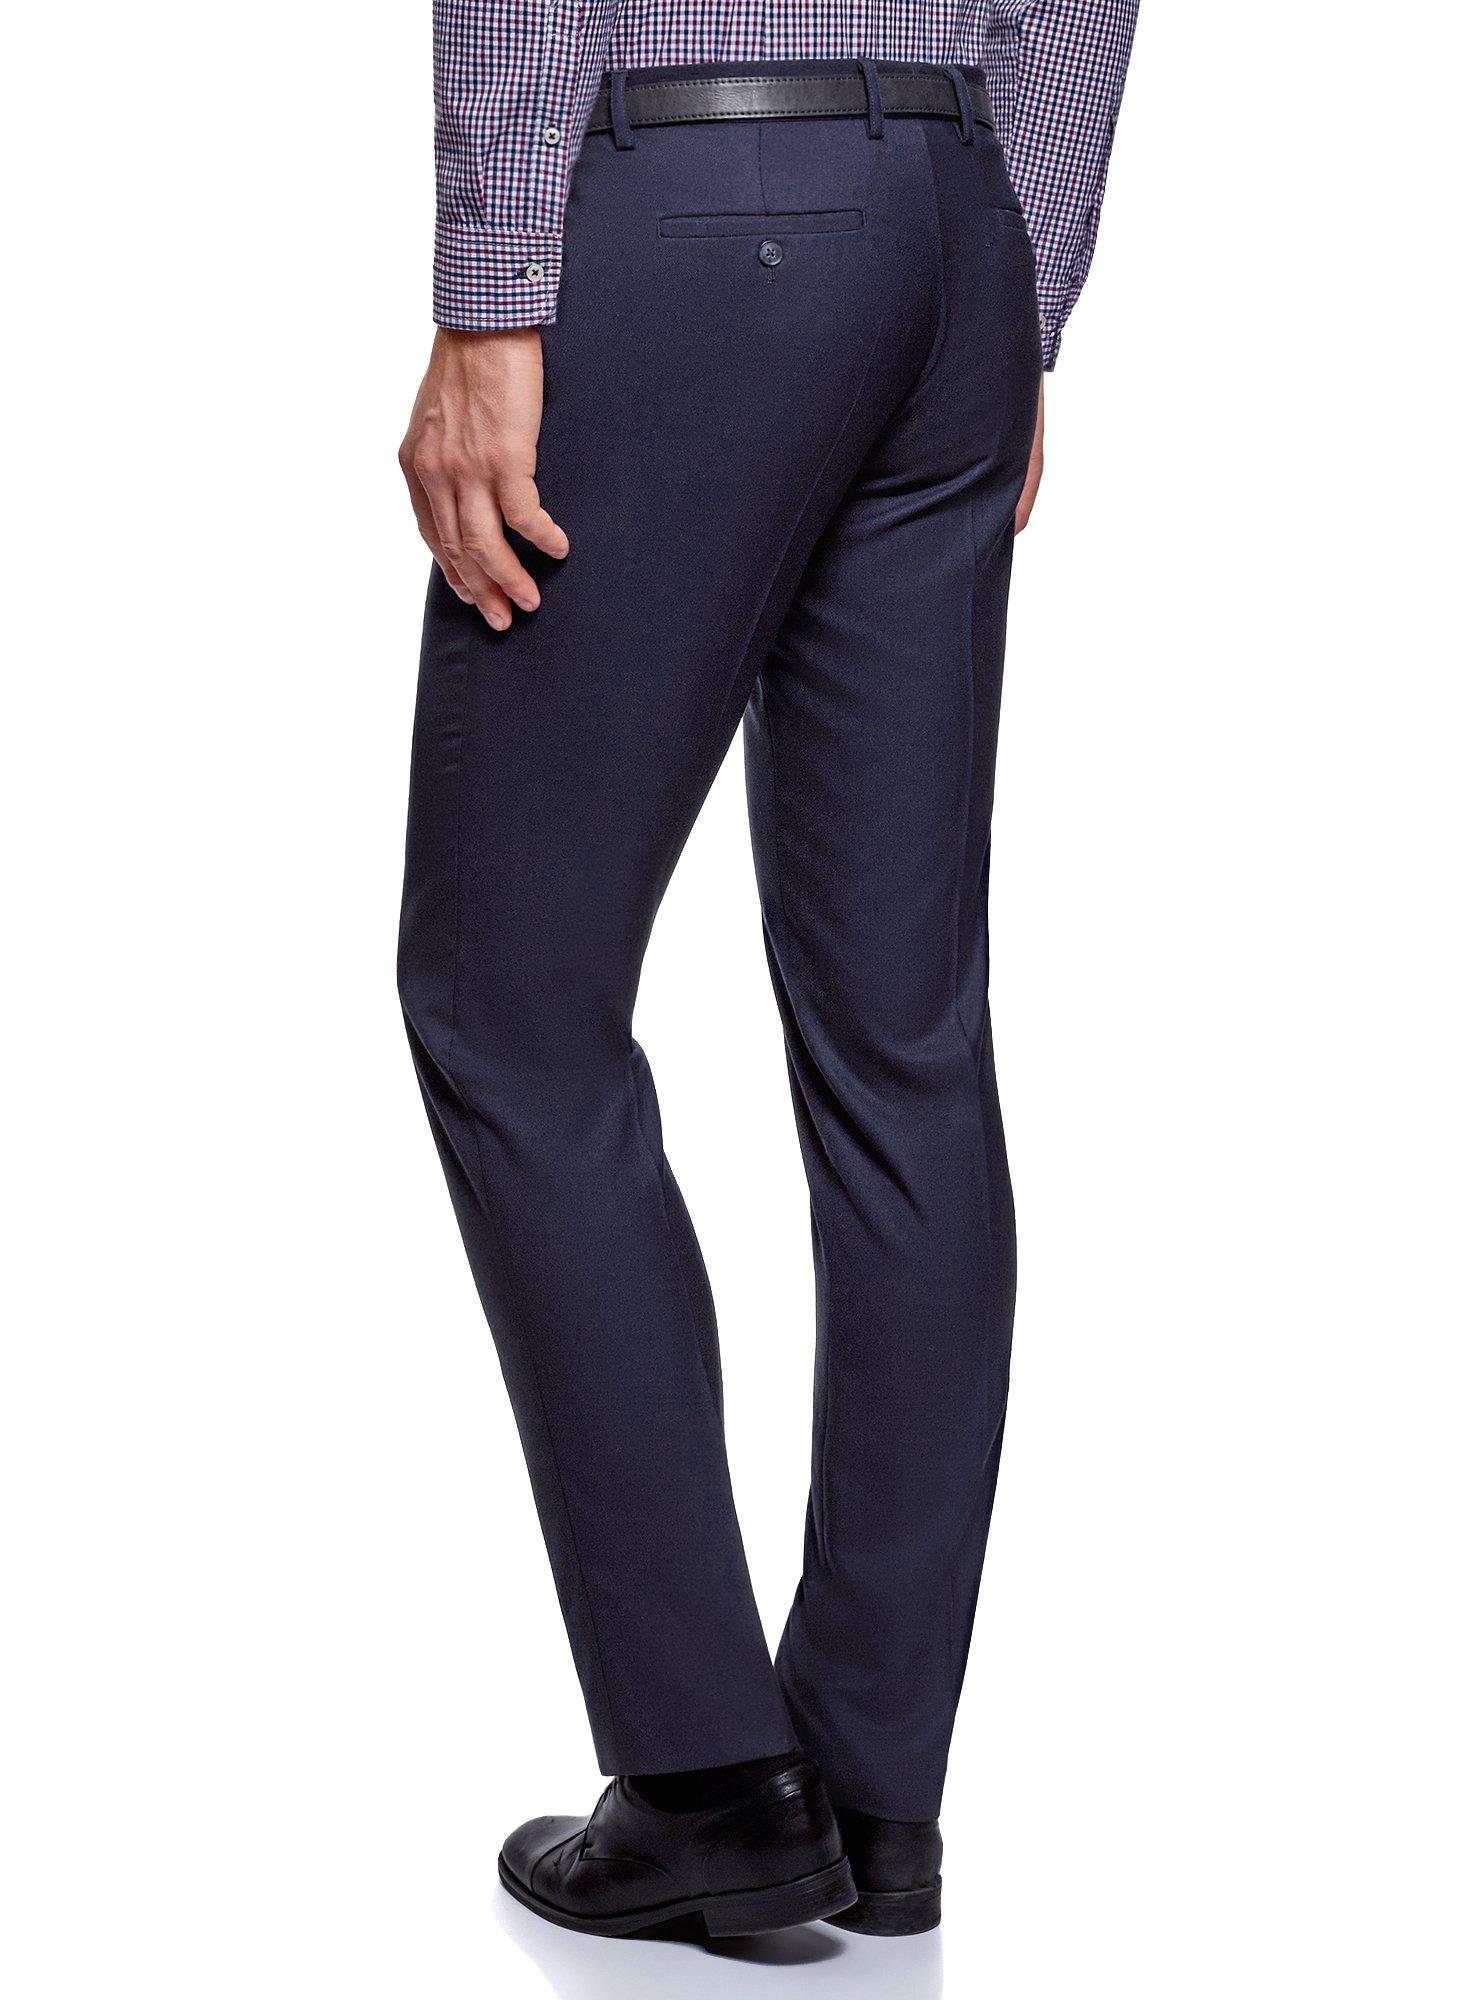 oodji Ultra Men's Basic Slim-Fit Trousers, Blue, US 28 / EU 36 / XS by oodji (Image #2)